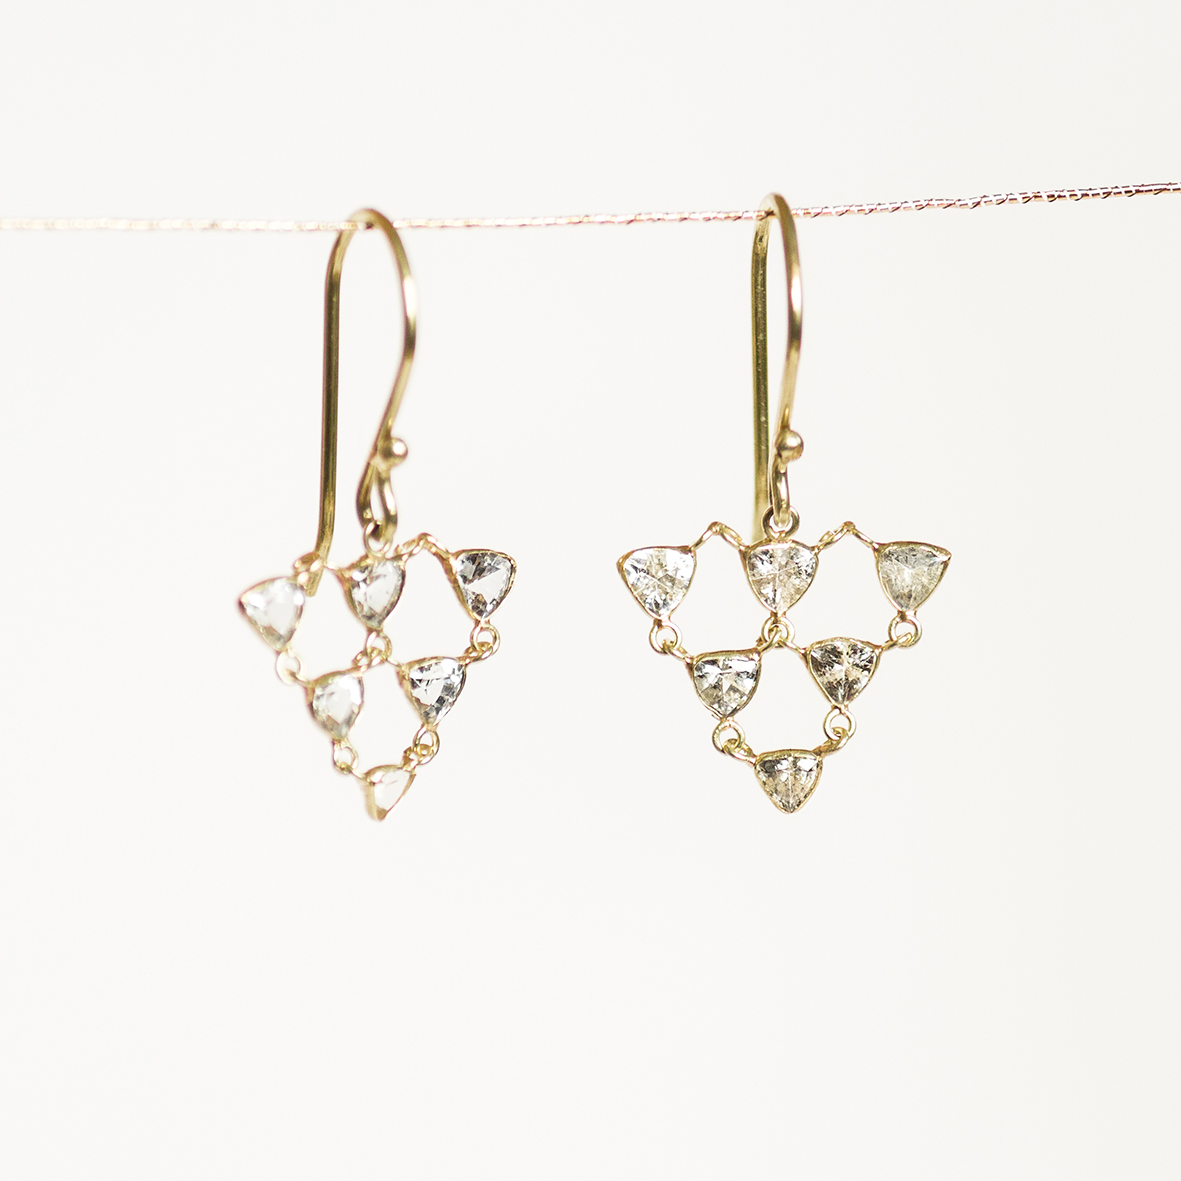 3. OONA_philo_ficha1_sapphire triangle earrings